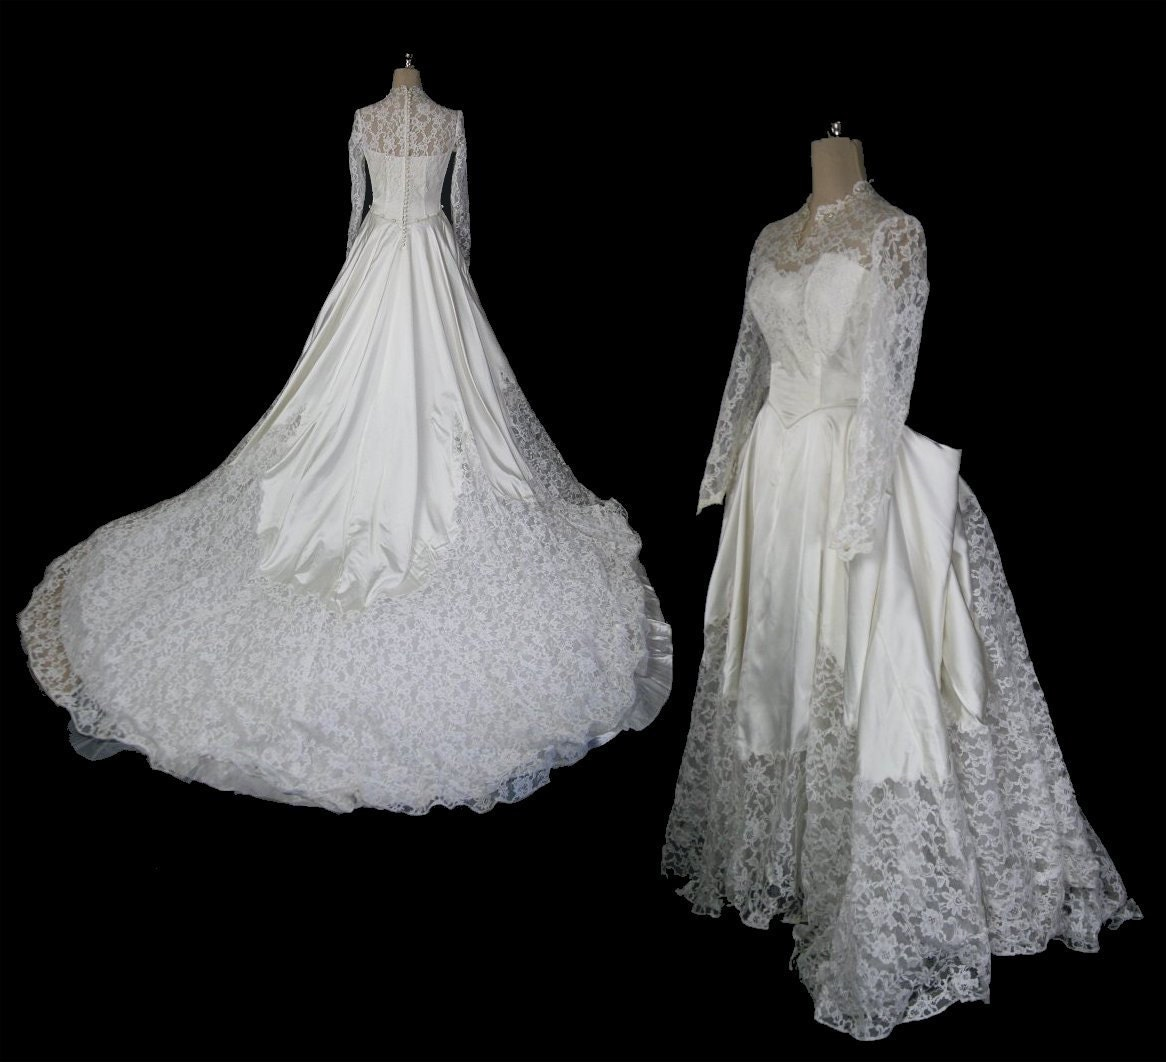 Vintage 1950s Princess Kate Wedding Dress, Long Sleeves & Illusion Neckline, XS / S